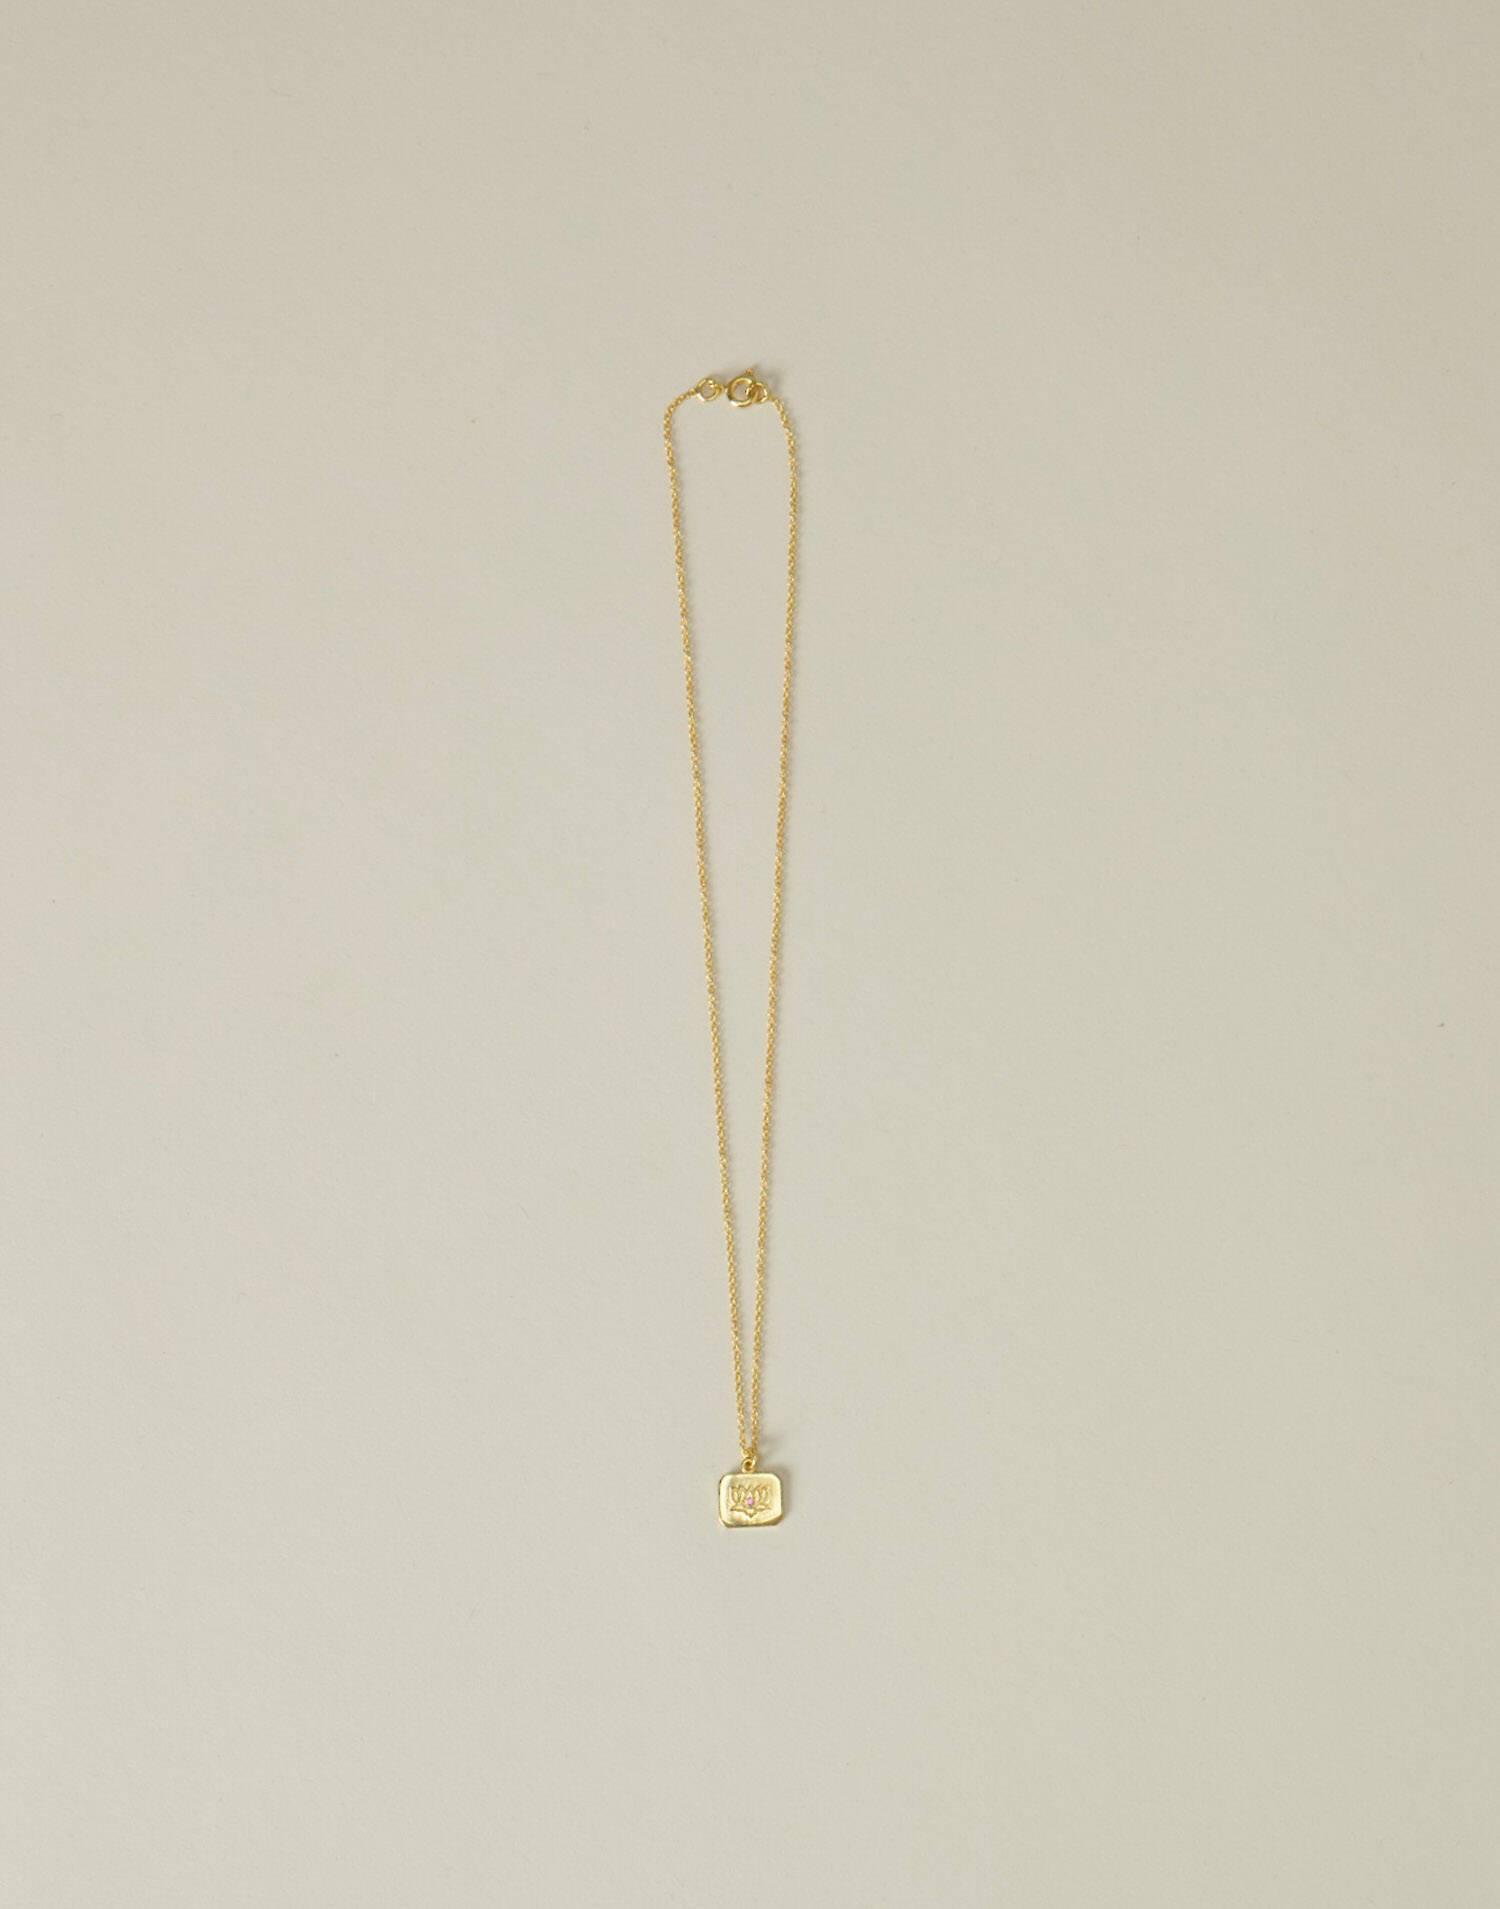 Collar flor de loto baño oro